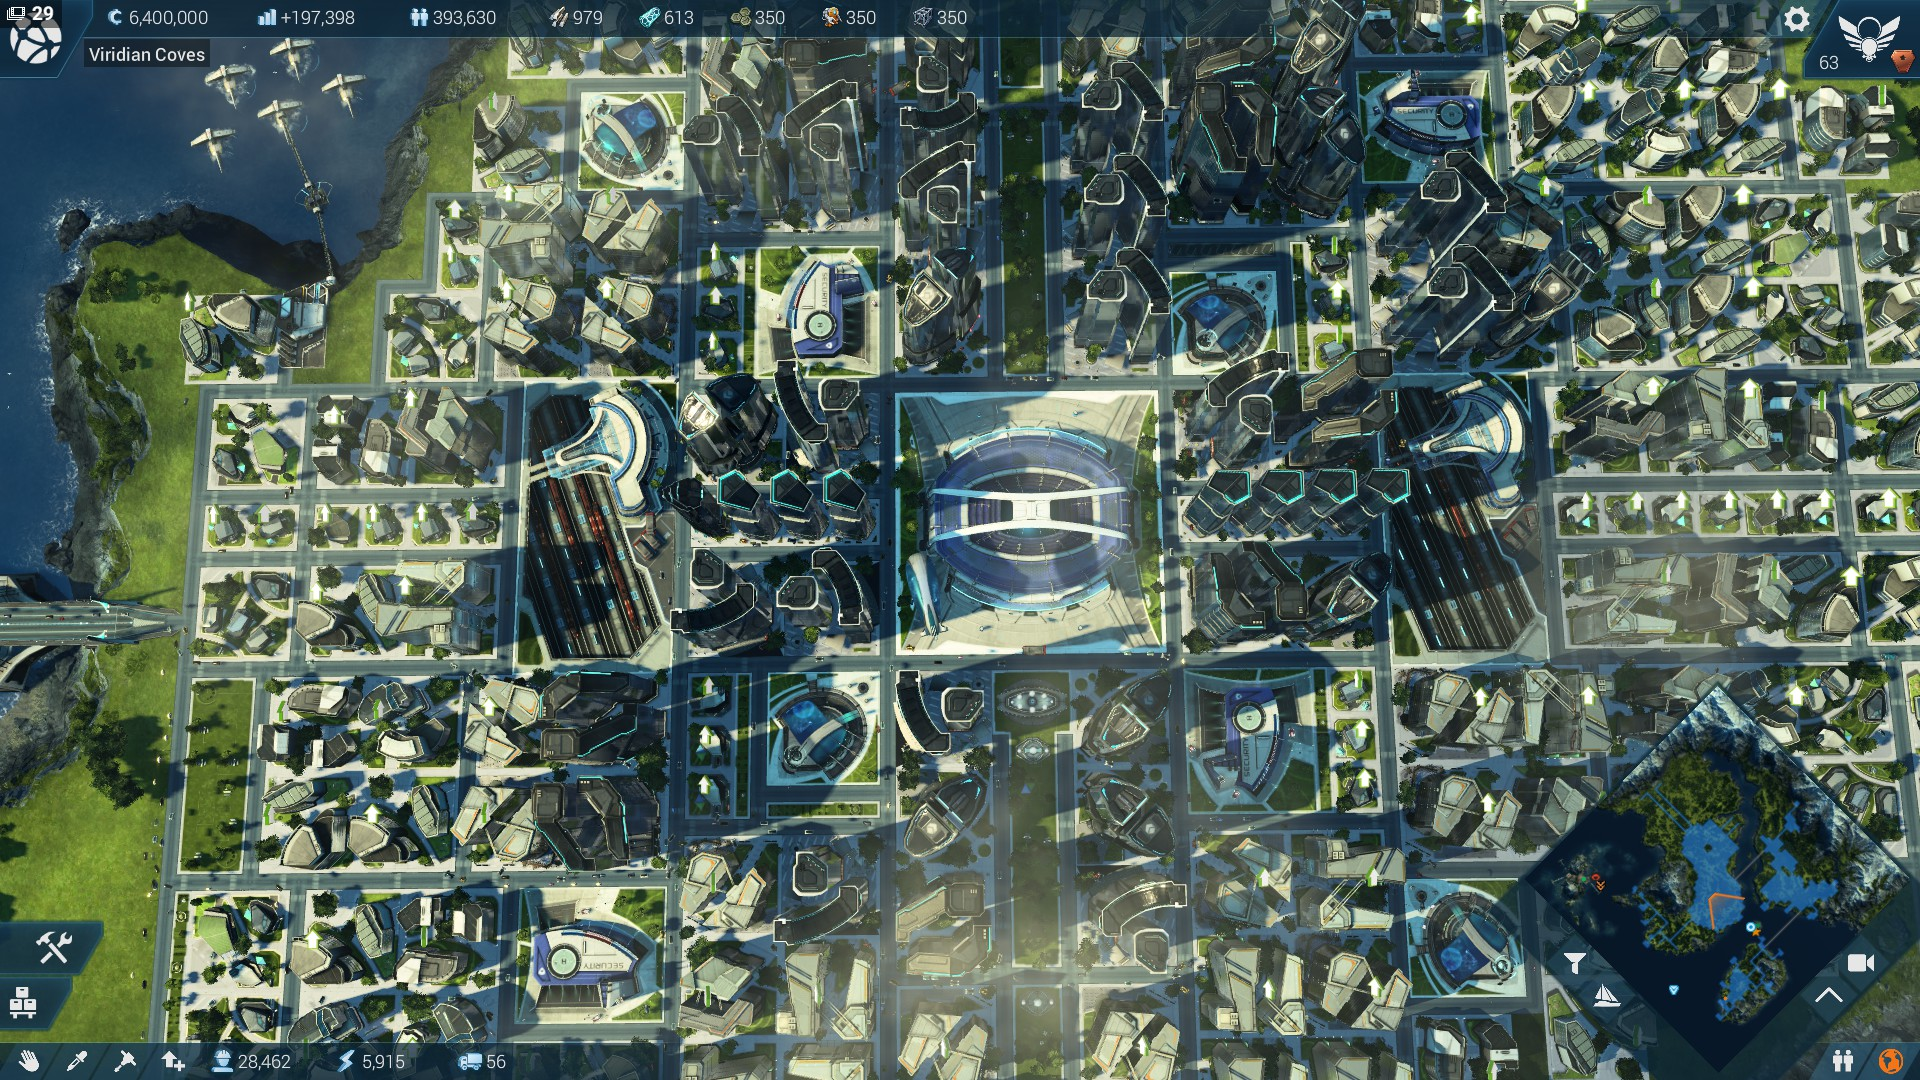 Floor Plan Simulator Building Layouts Anno 2205 Wikia Fandom Powered By Wikia